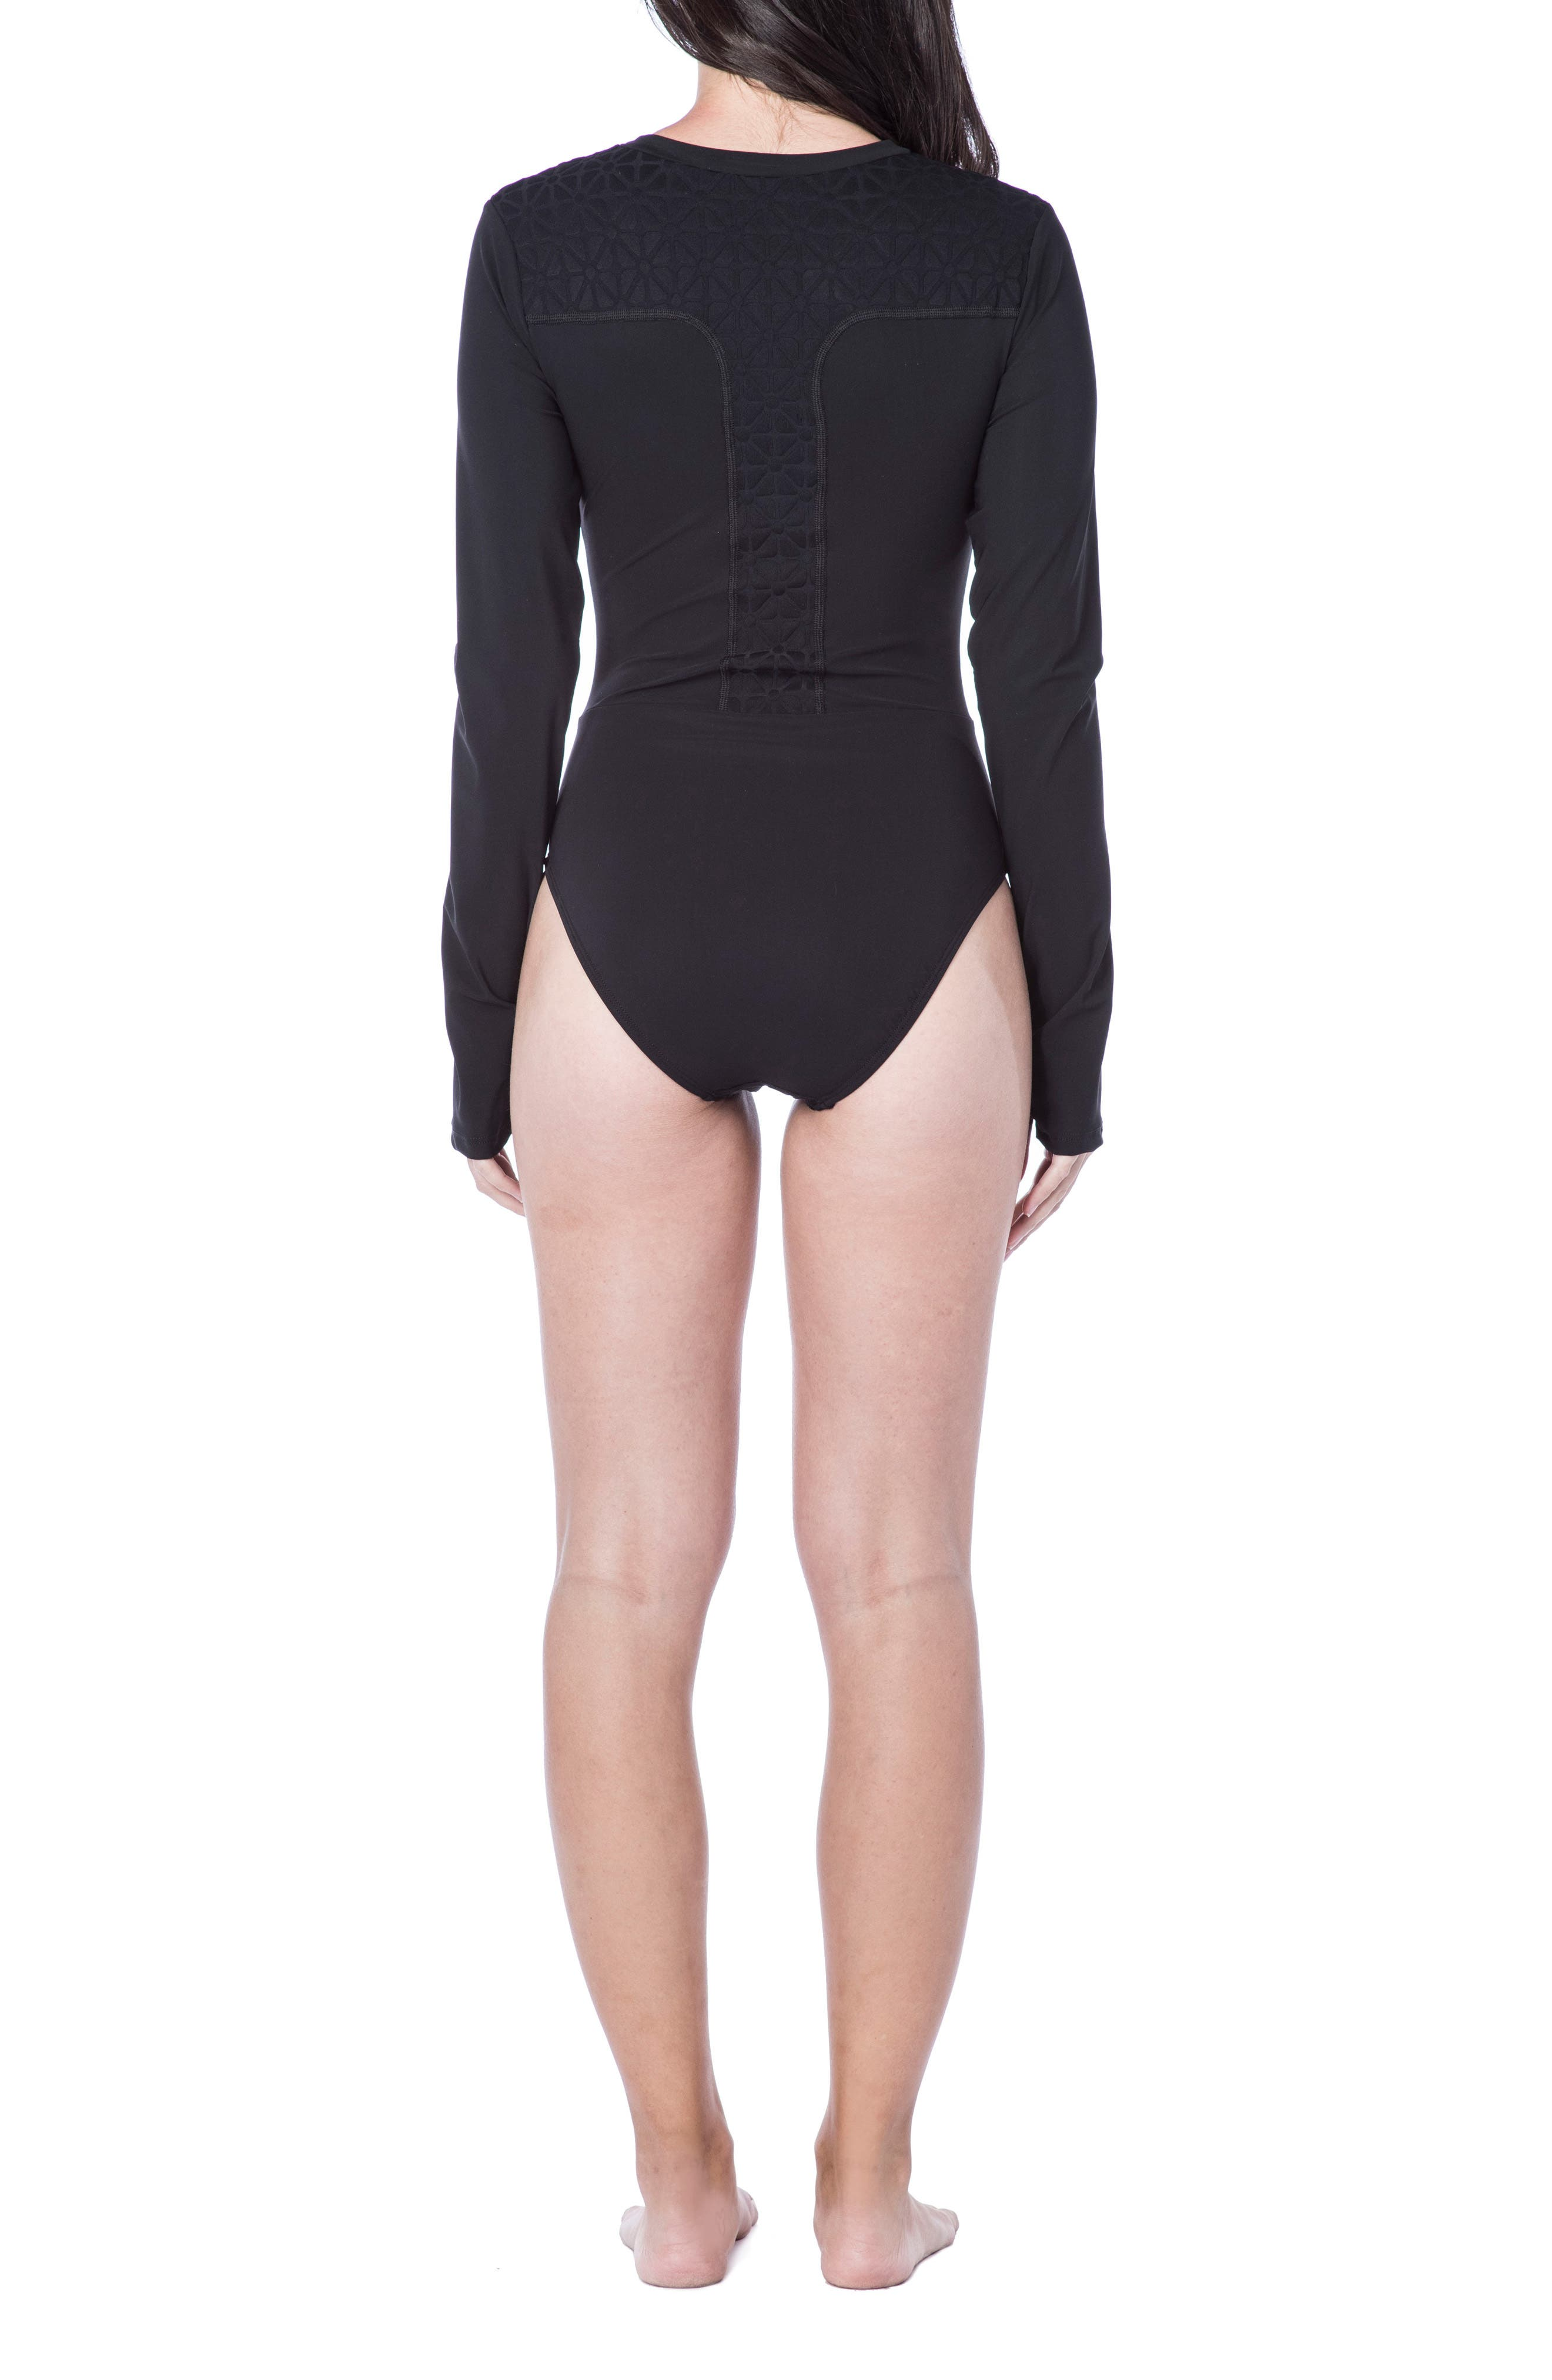 Alternate Image 2  - Trina Turk Sunshine Jacquard One-Piece Paddle Suit